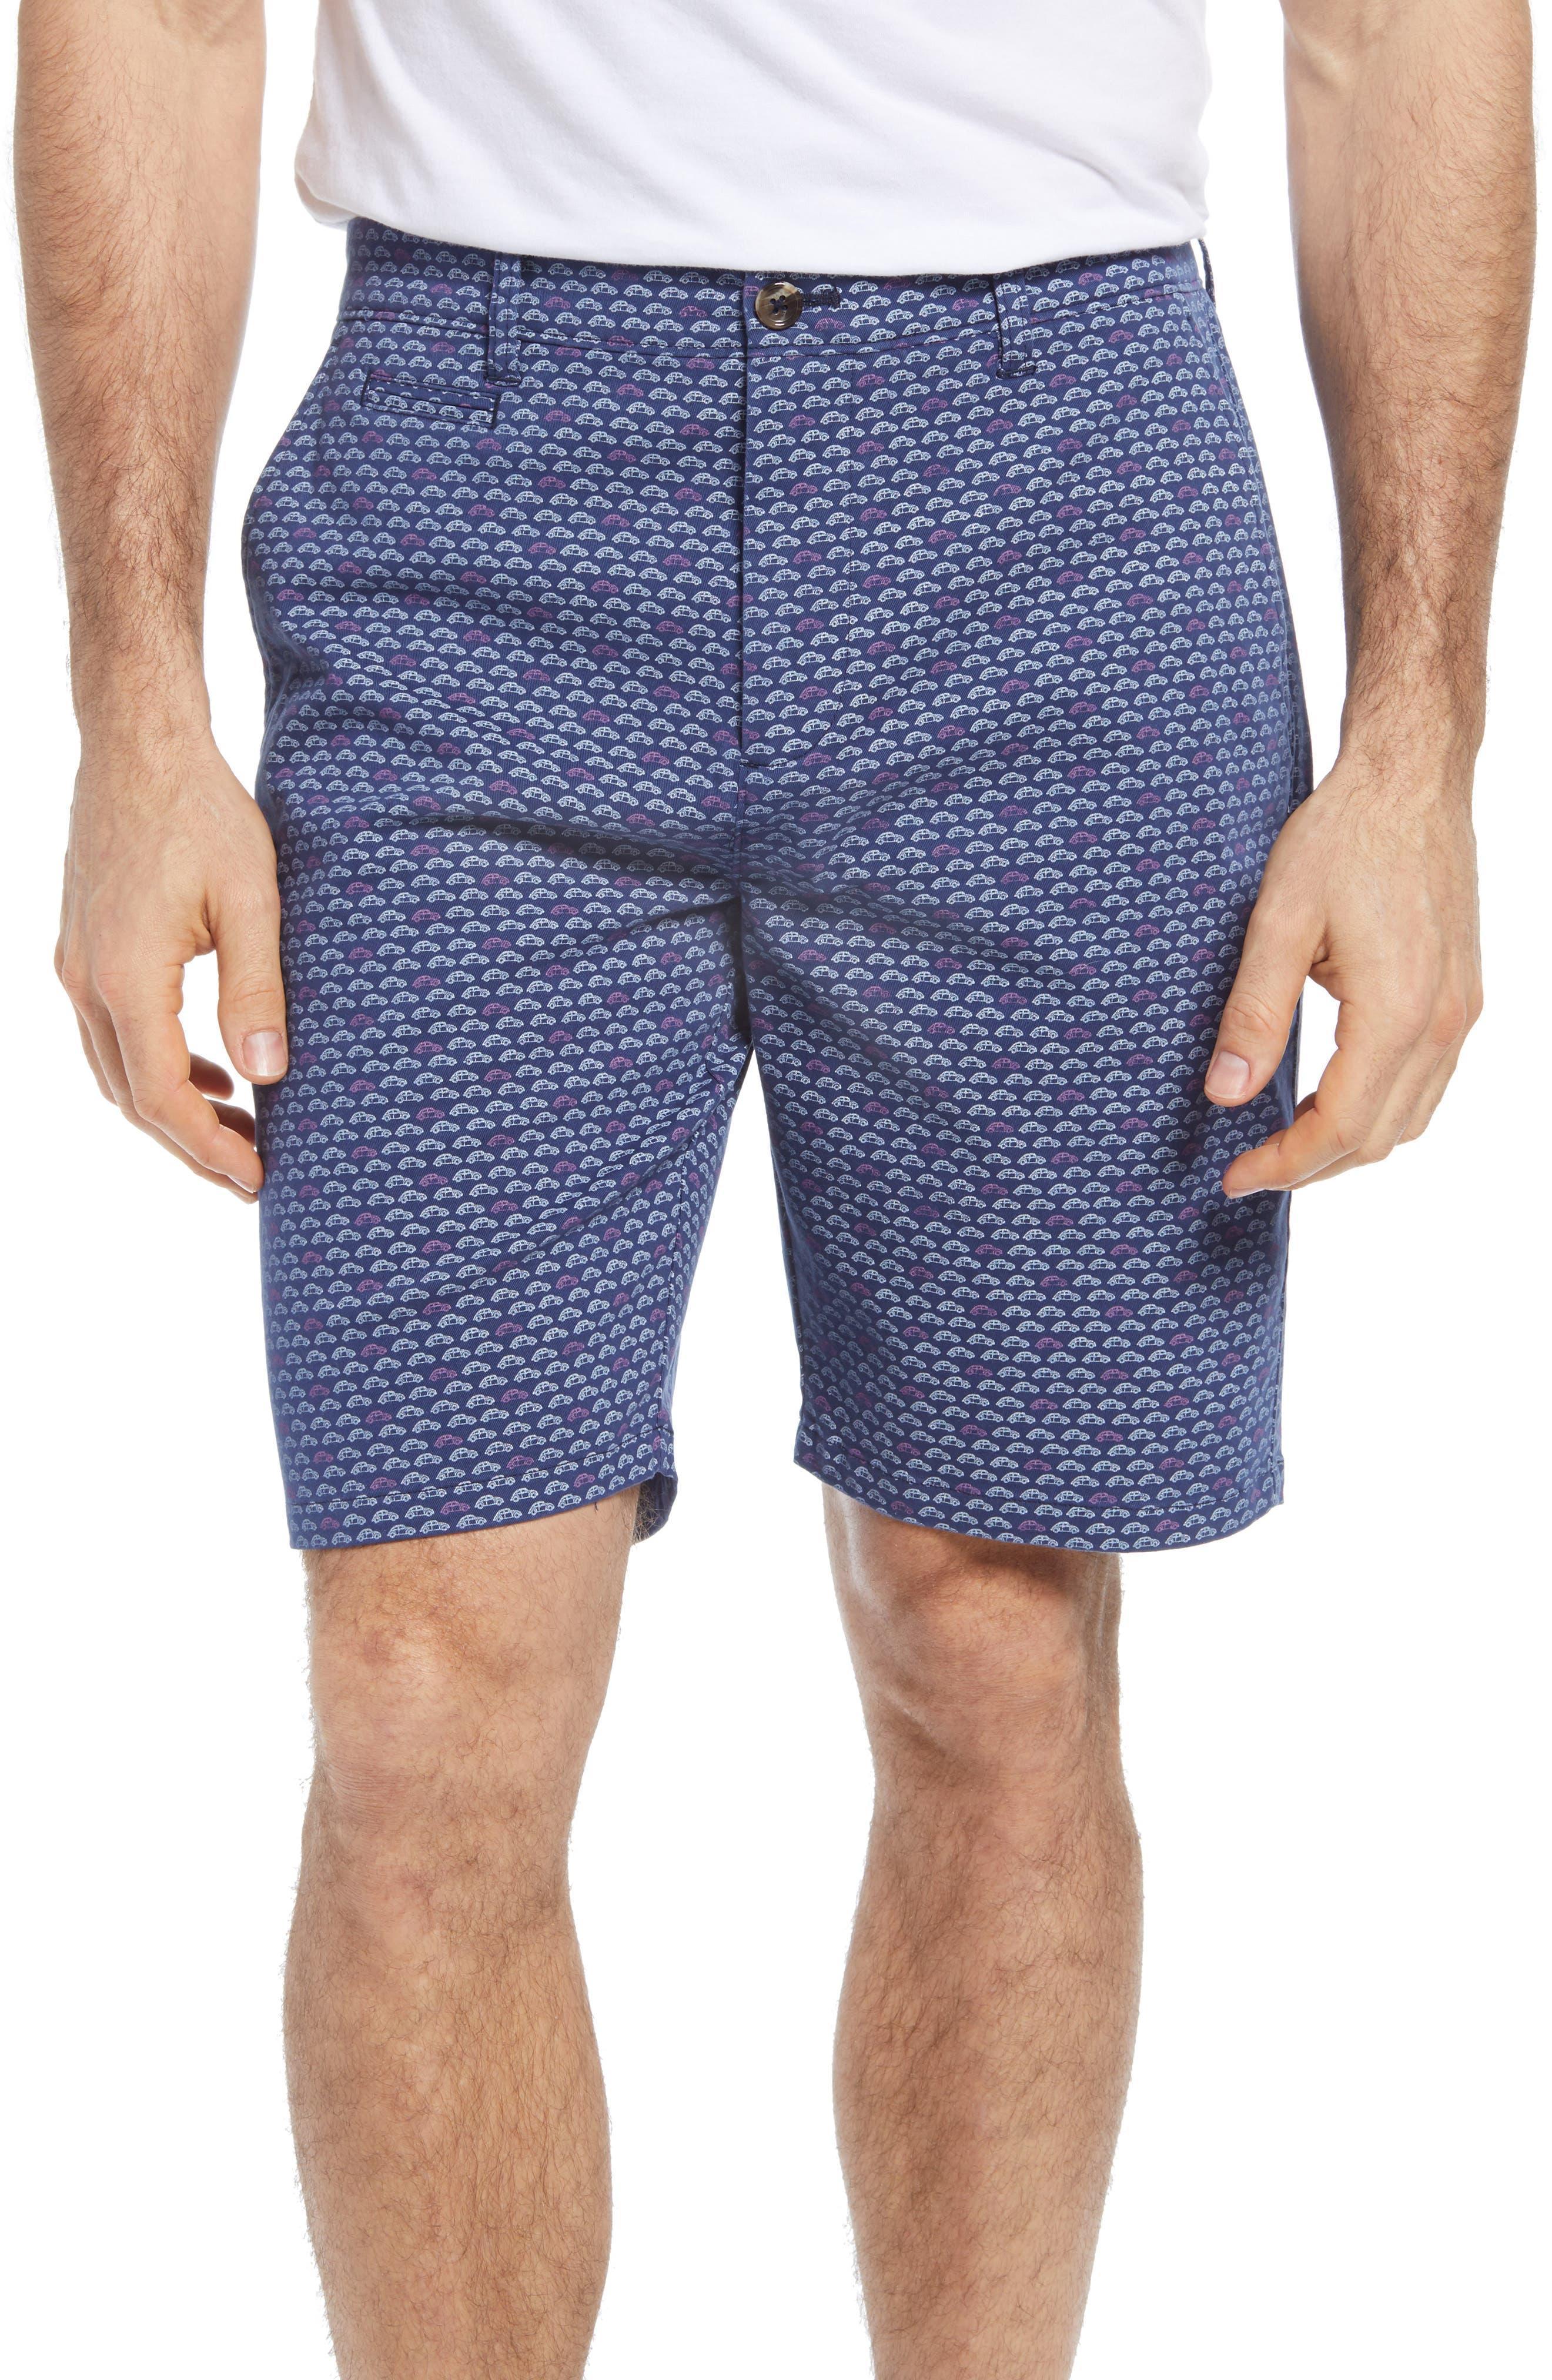 Men's Fahrvergnugen Stretch Shorts